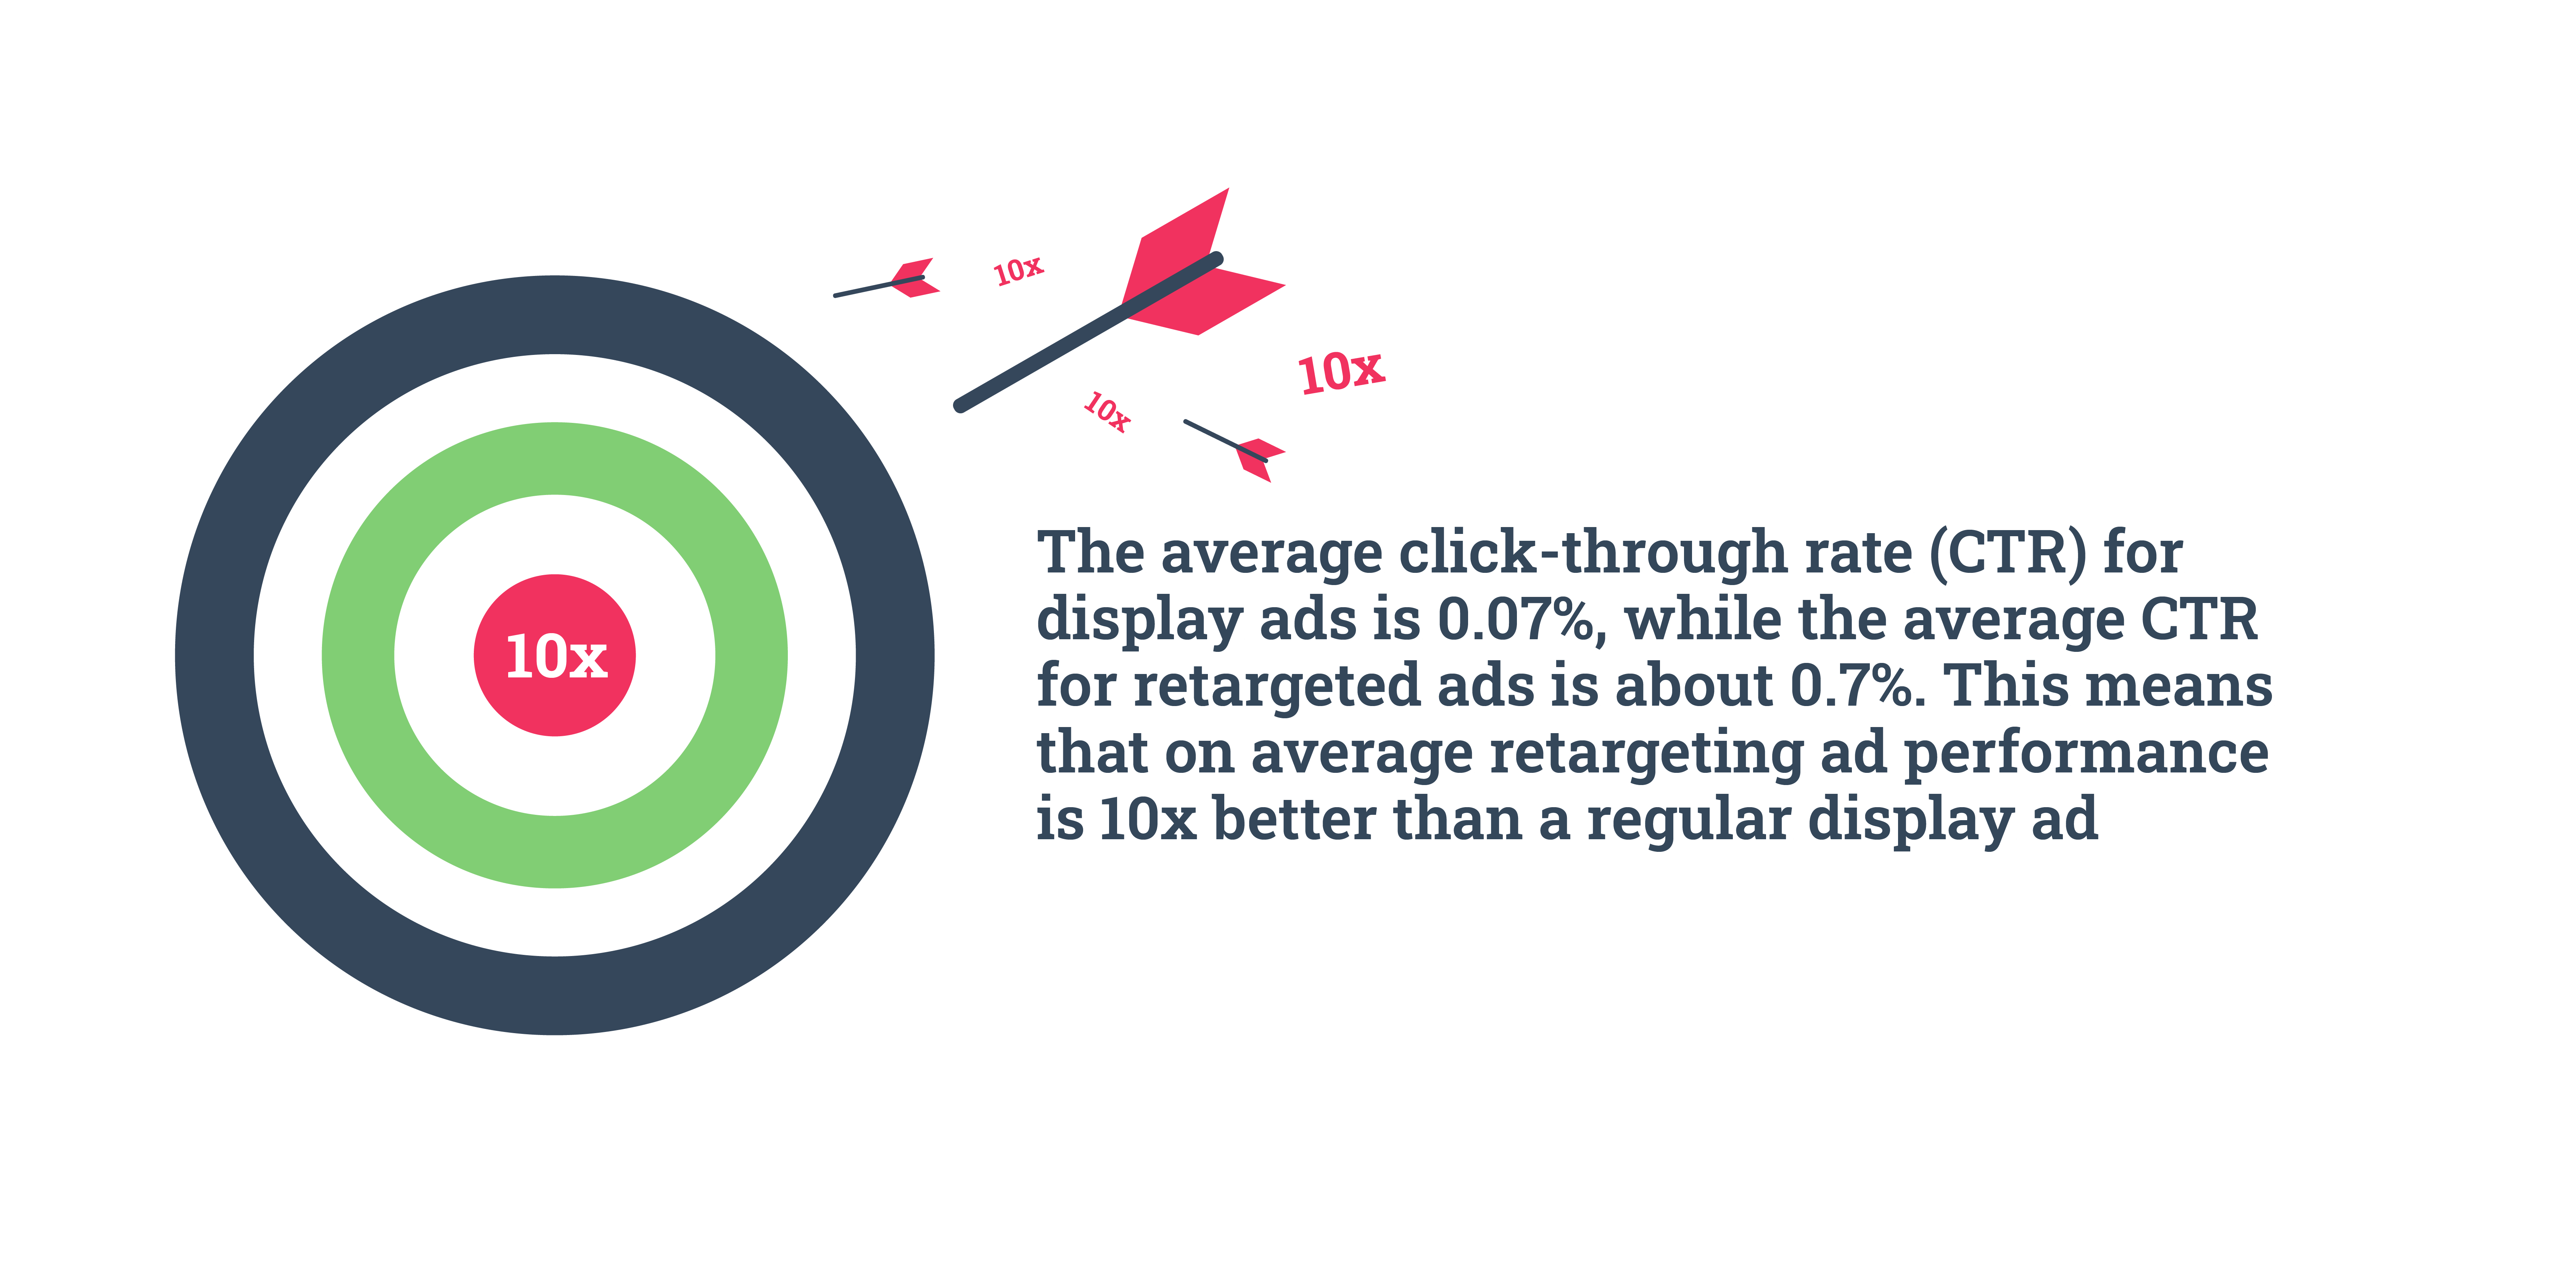 Retargeting ads performance statistic